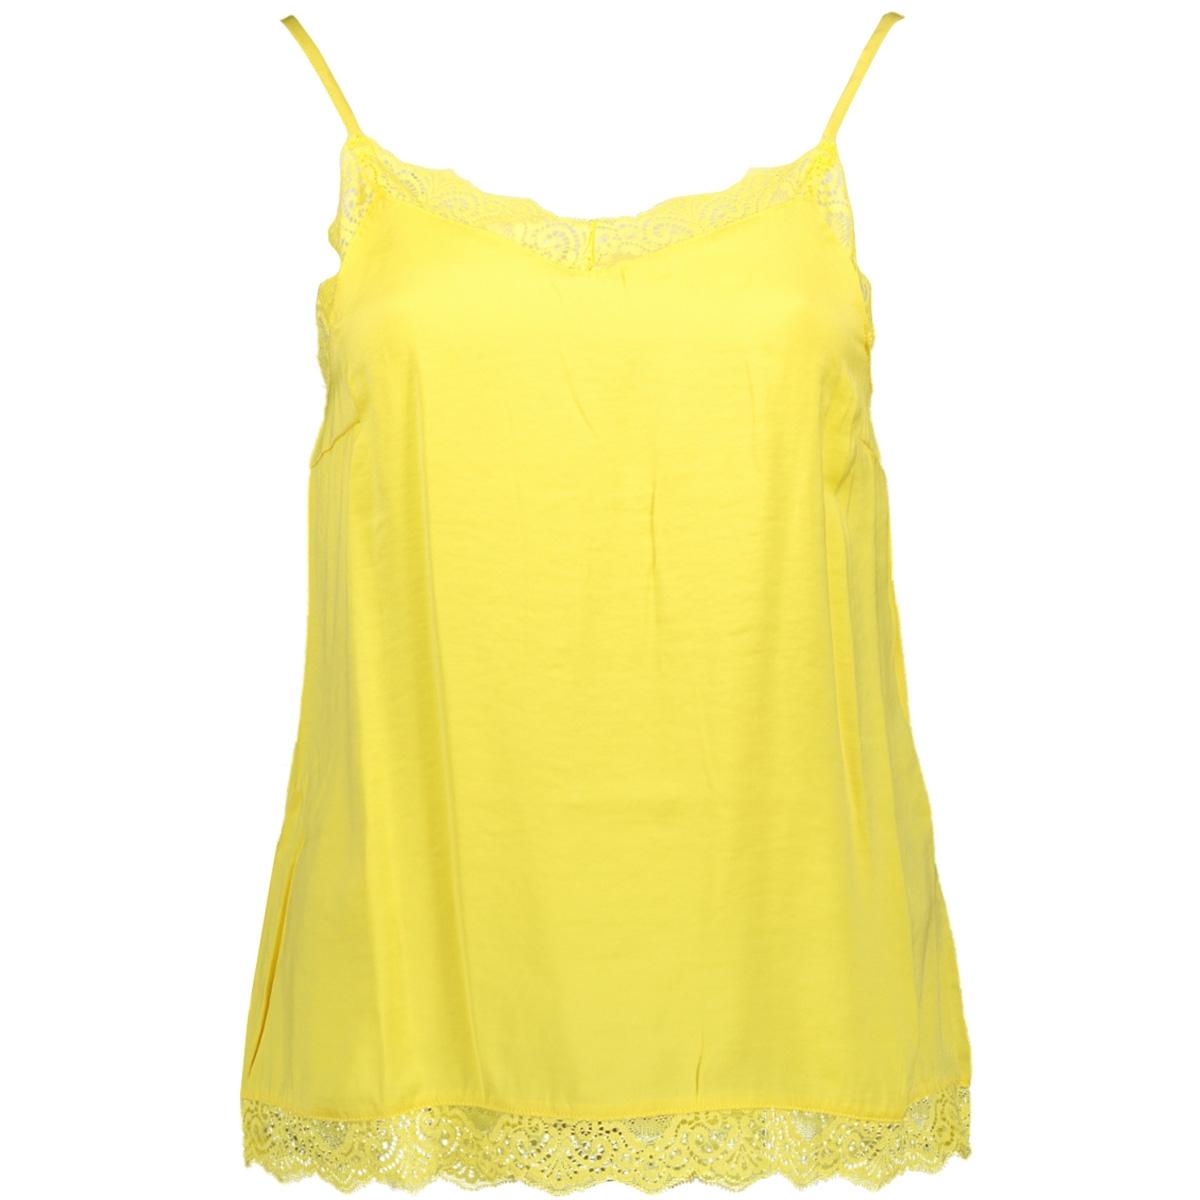 vicava lace singlet fav 14045939 vila top goldfinch